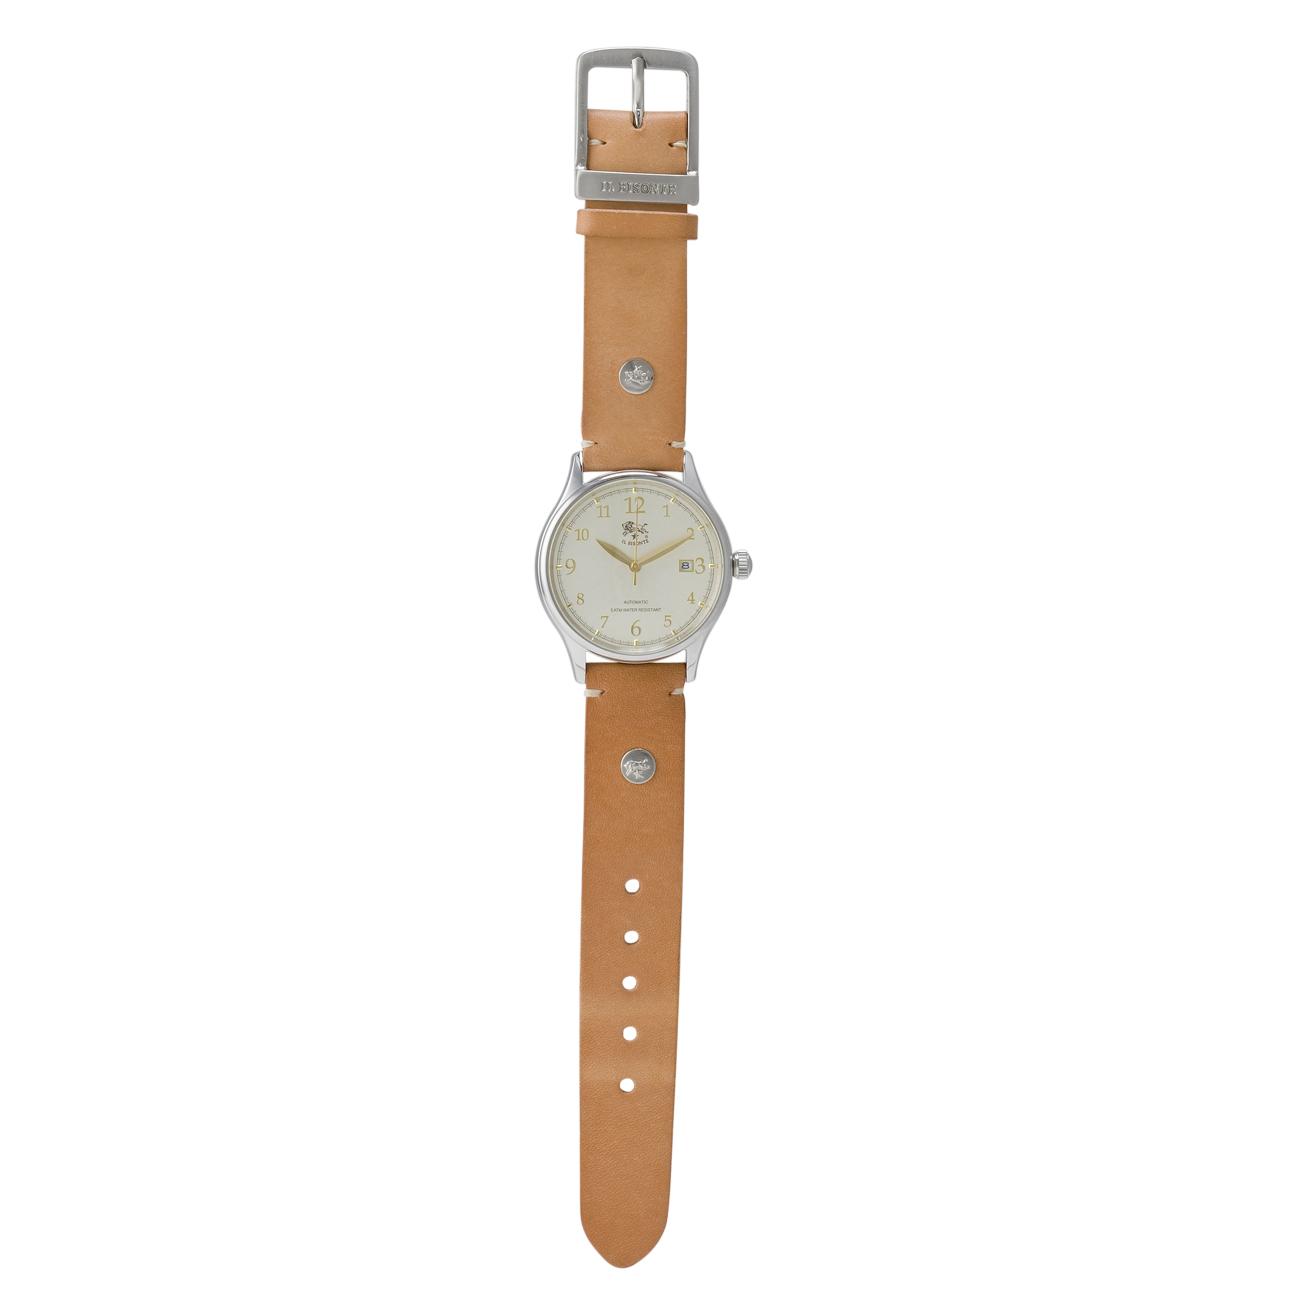 IL BISONTE (イル ビゾンテ) 日本公式オンラインストア 腕時計(ベルト) 5422310297